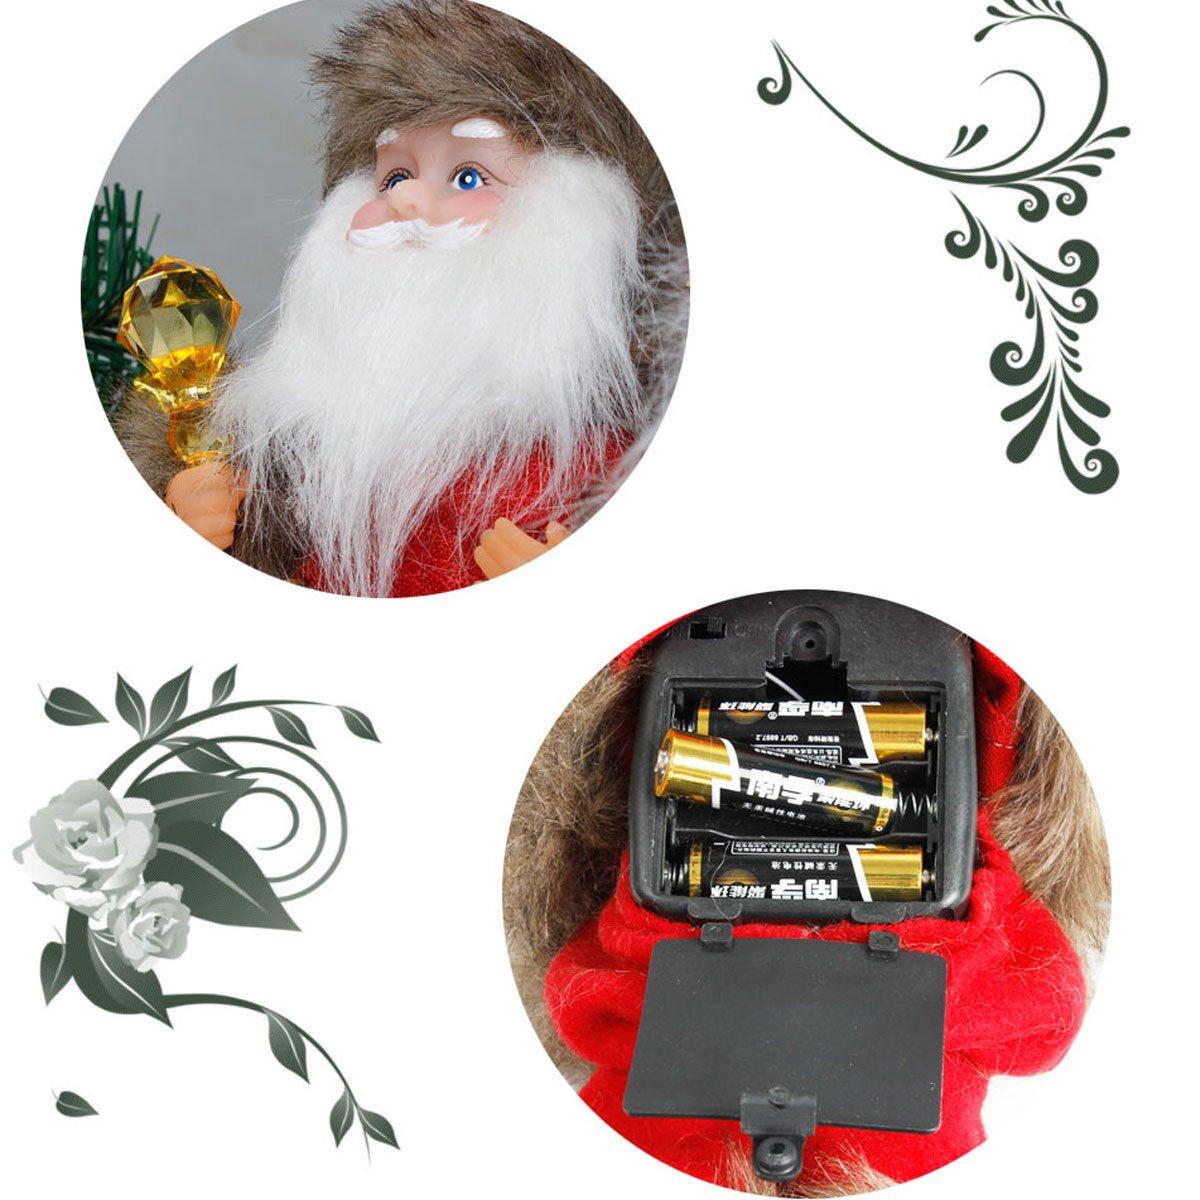 Lummy Electric Santa Claus Toy Ornaments Dancing Singing Dollsnovelty Ny Holiday Gift Tree Pendant Dropornaments Electric Santa Claus Toy Ornaments Dancing Singing